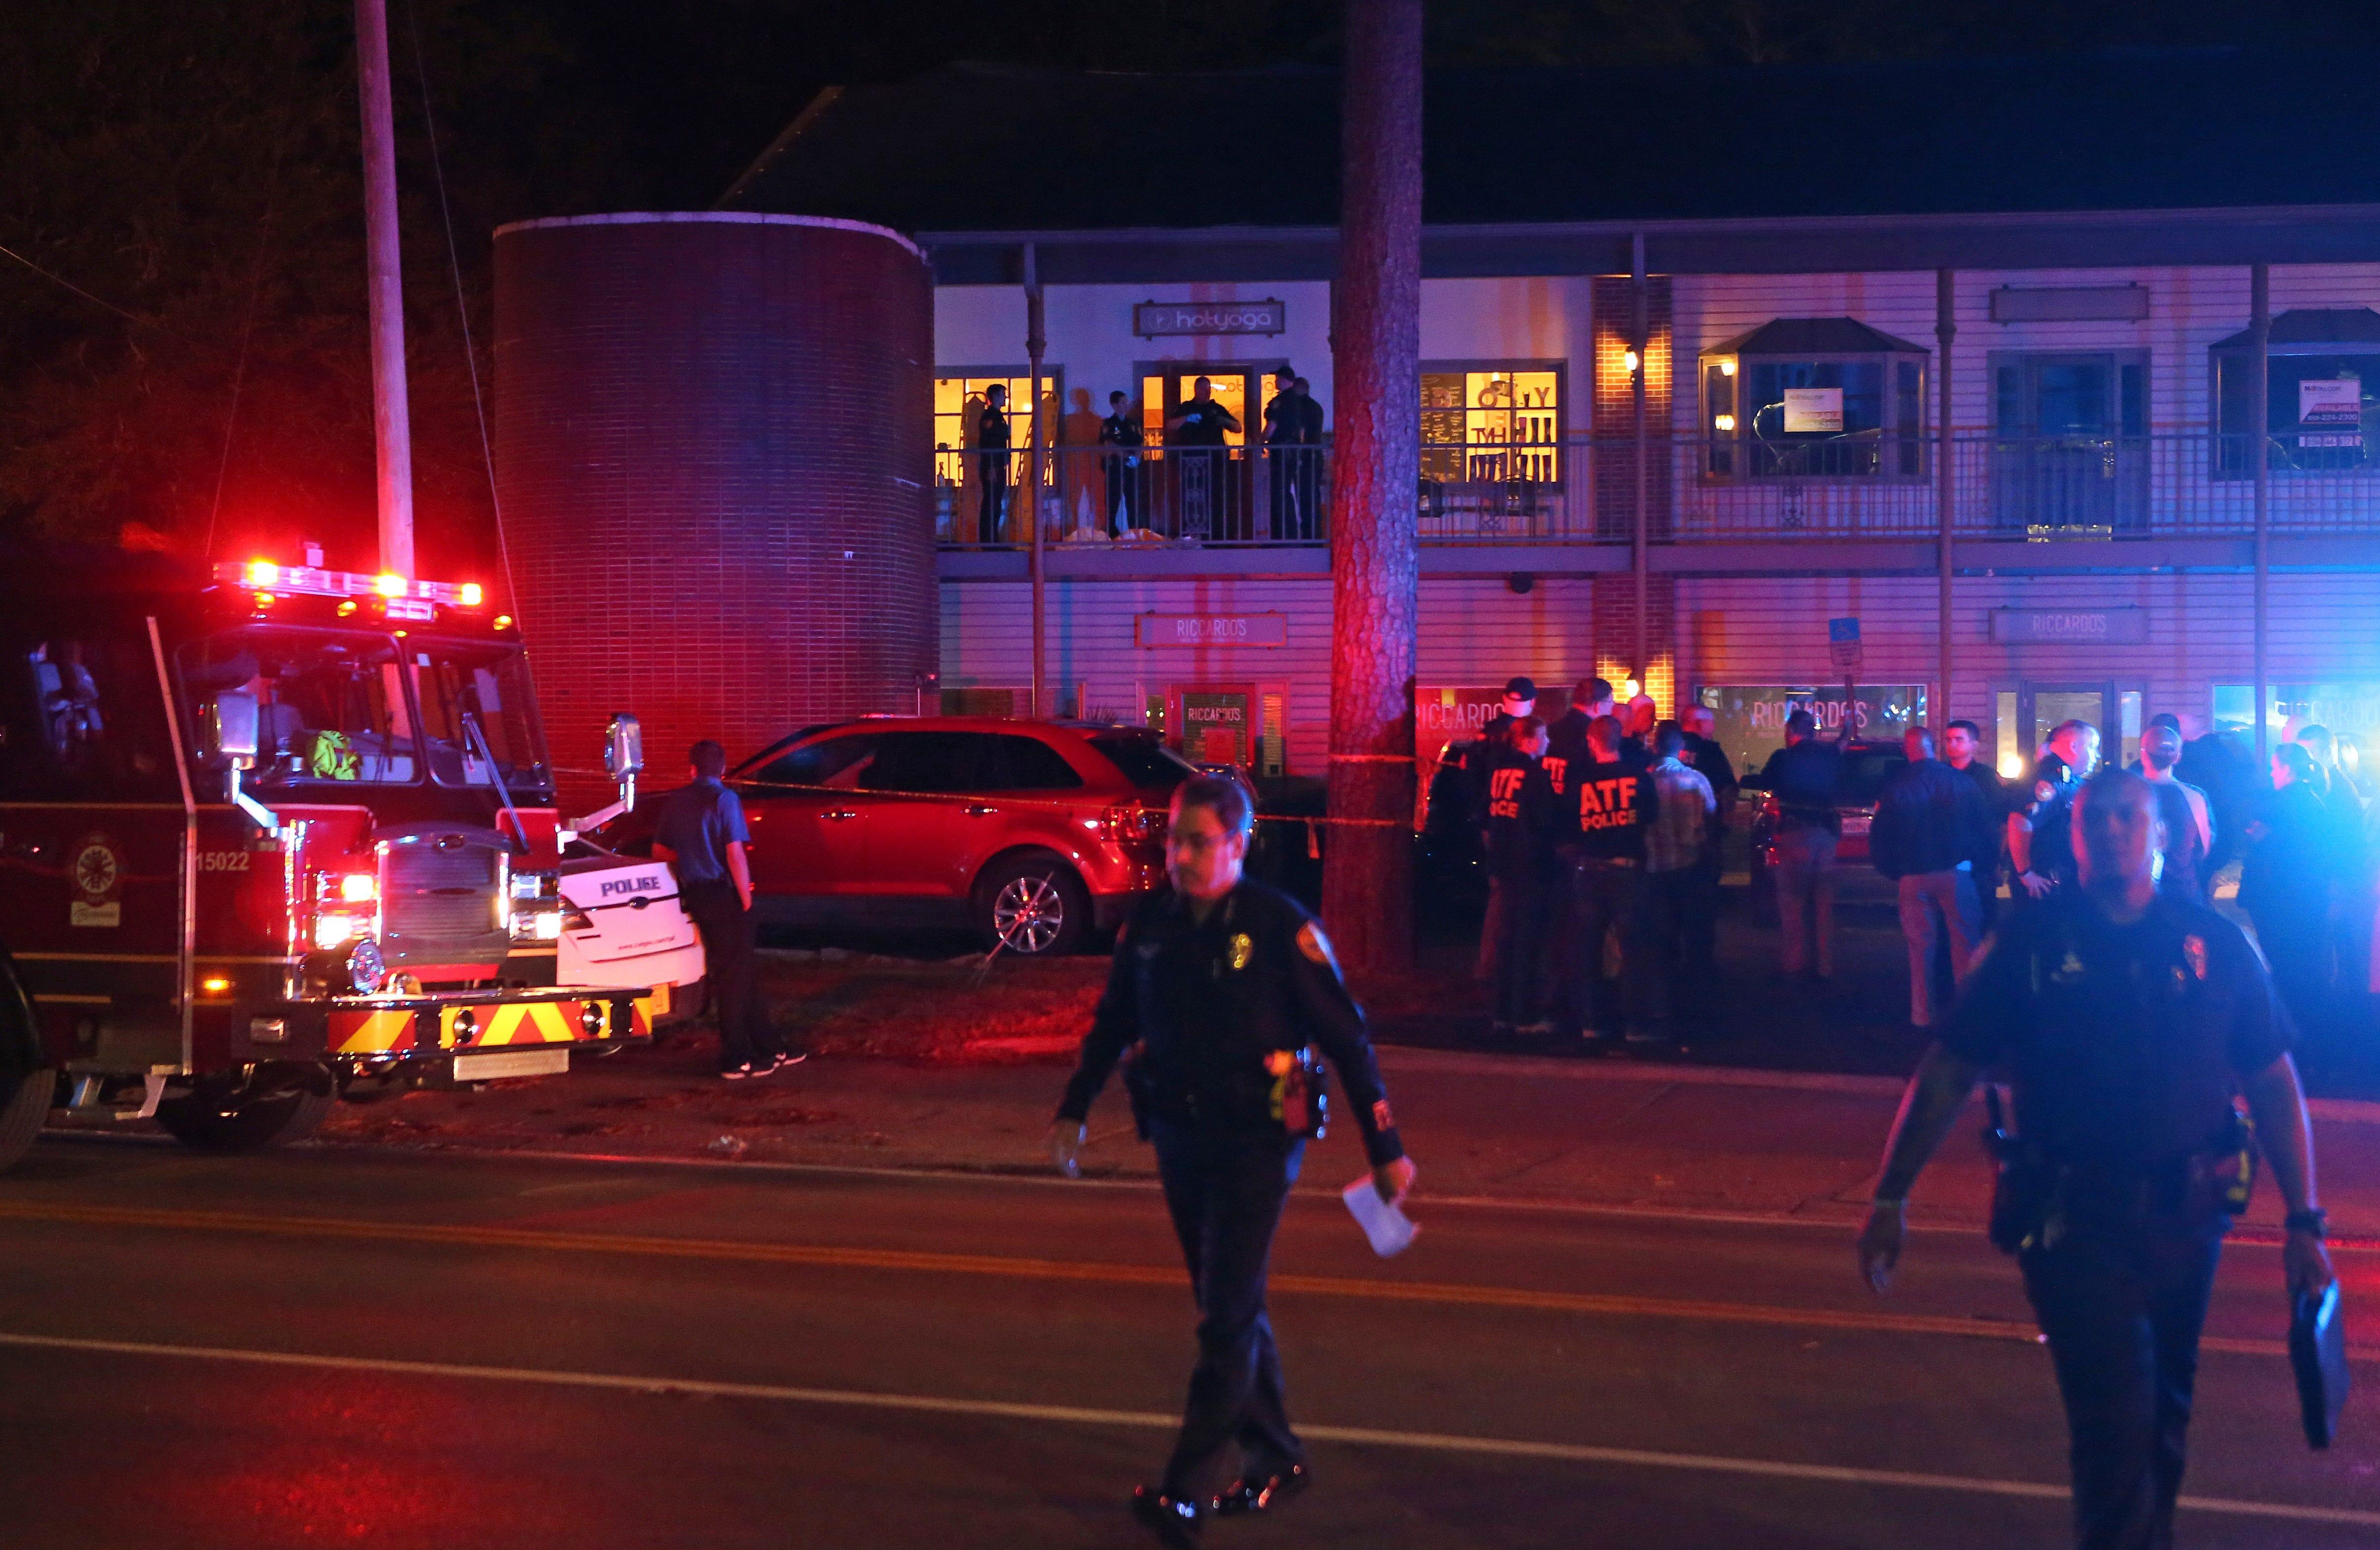 Yoga studio gunman planned 'horrific event' for months, police say